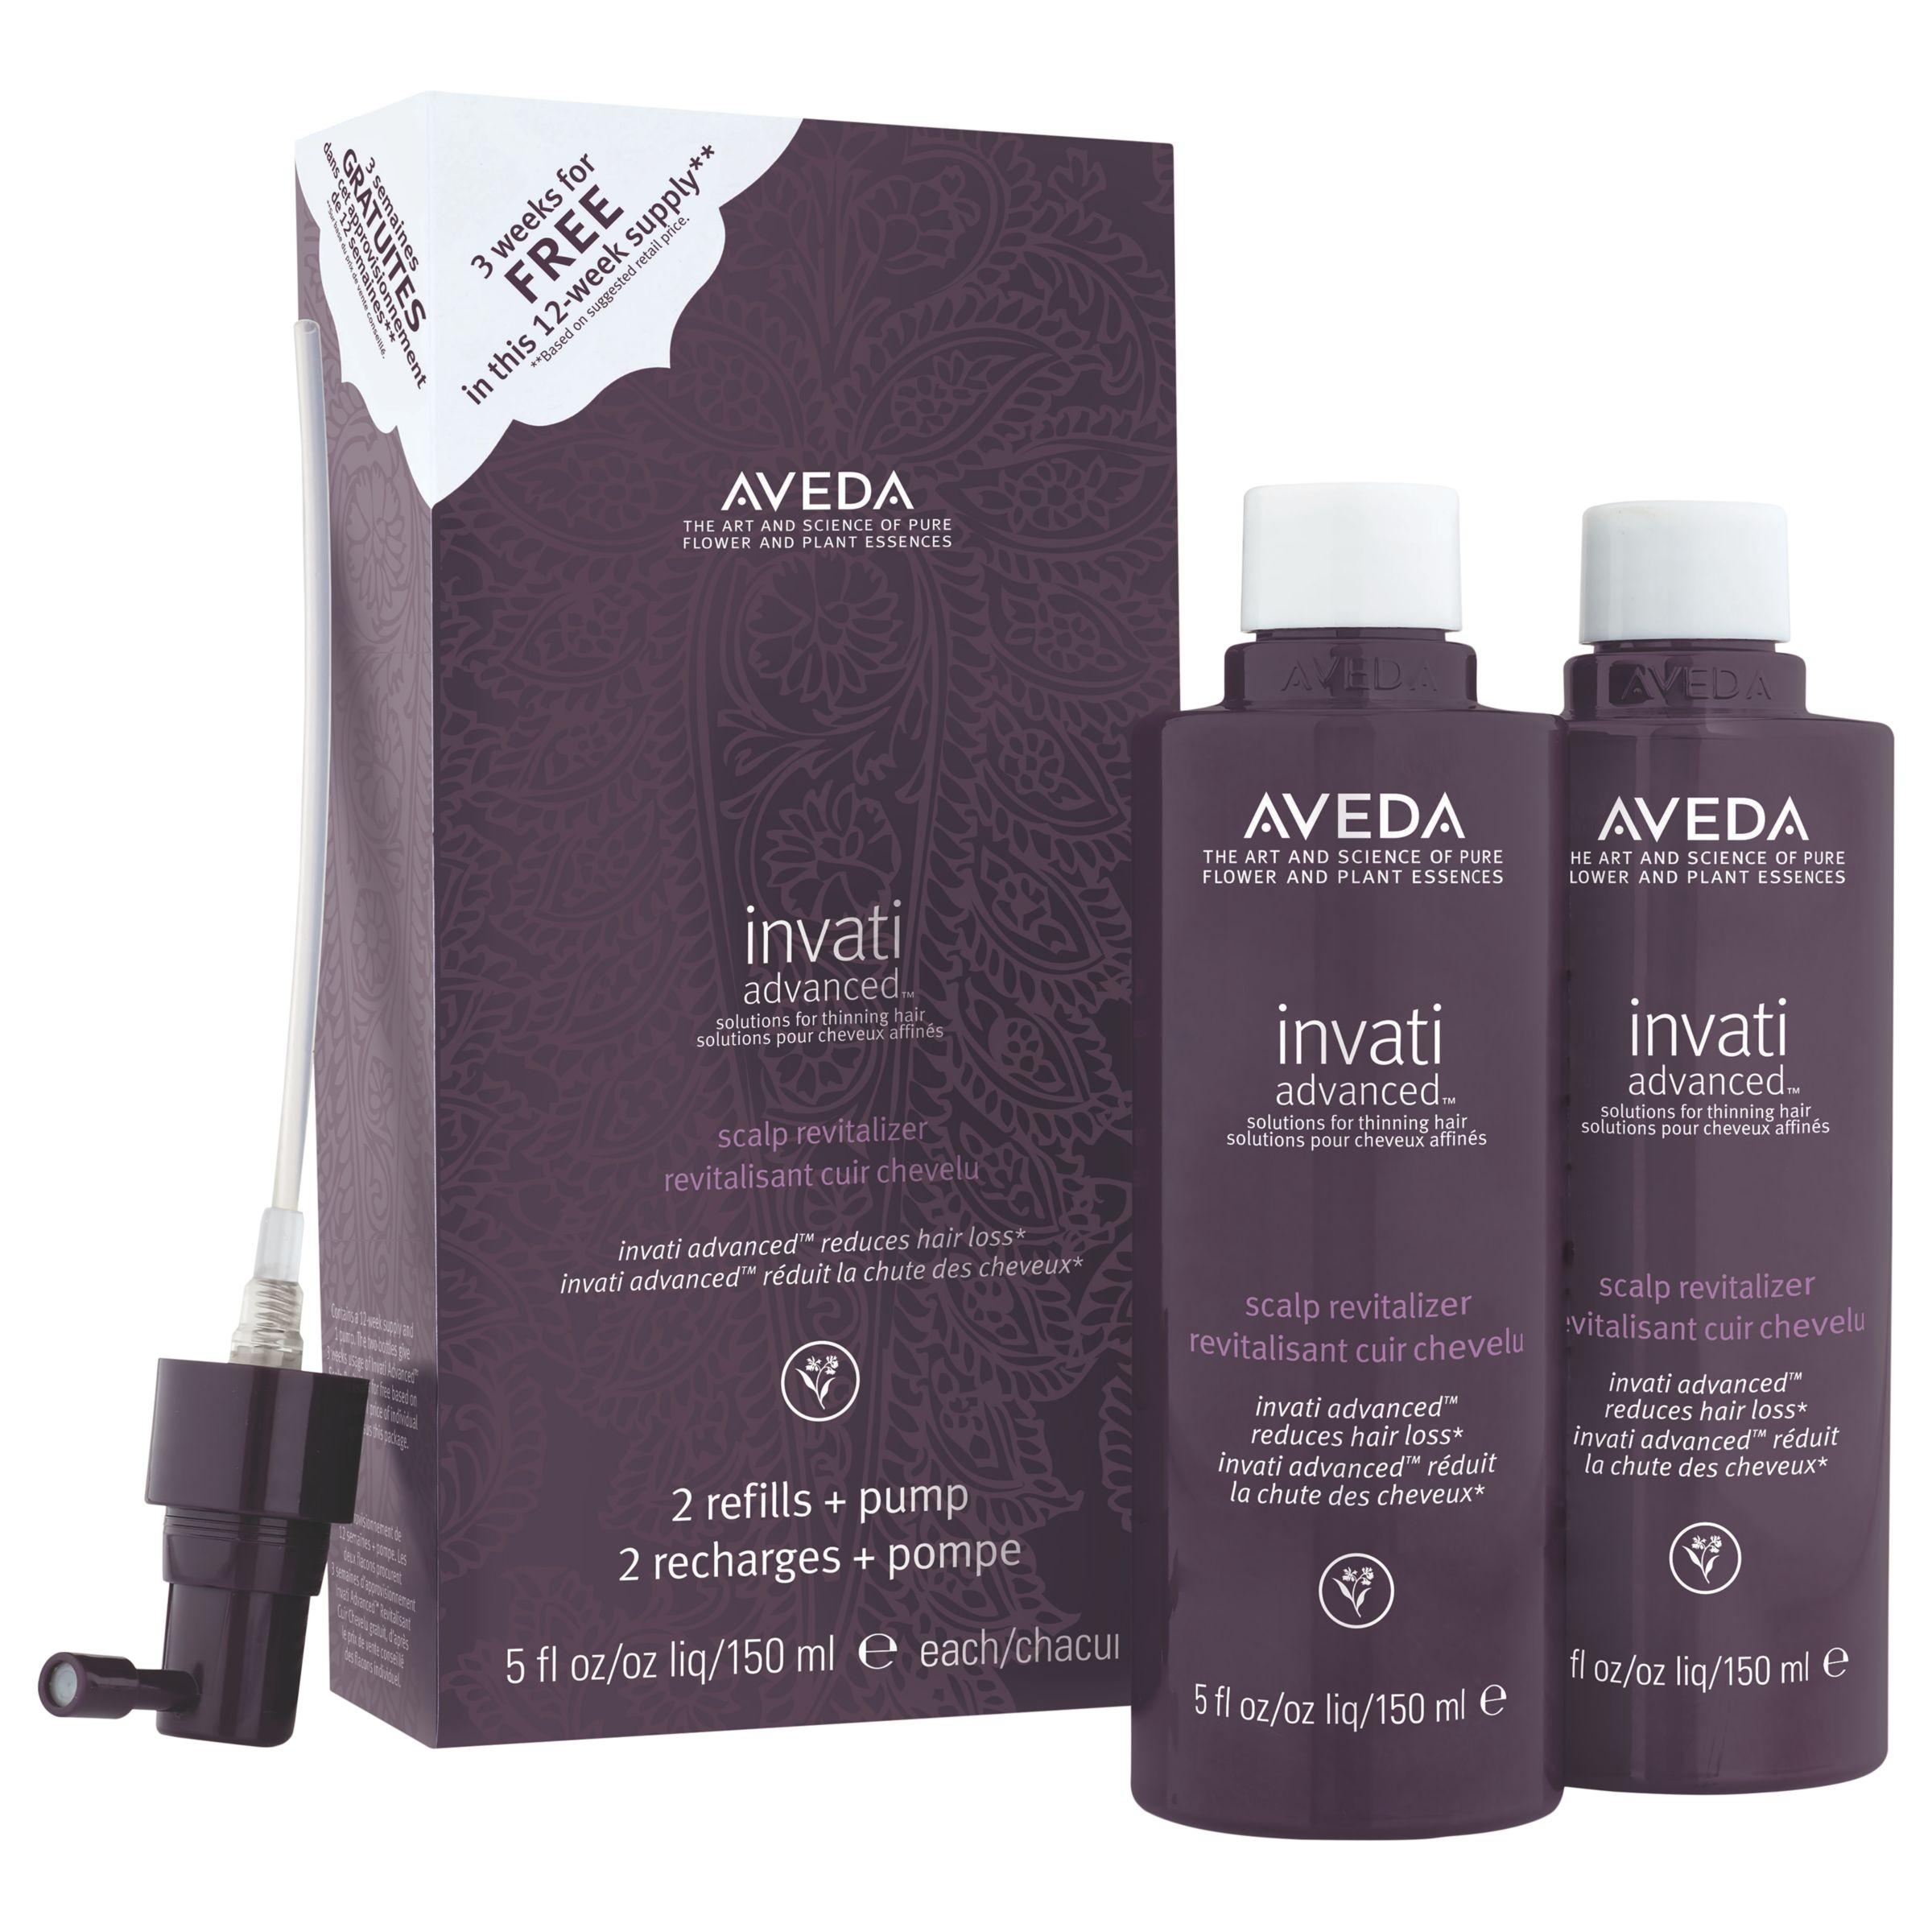 AVEDA Aveda Invati Advanced™ Scalp Relitalizer Duo, 2 x 150ml